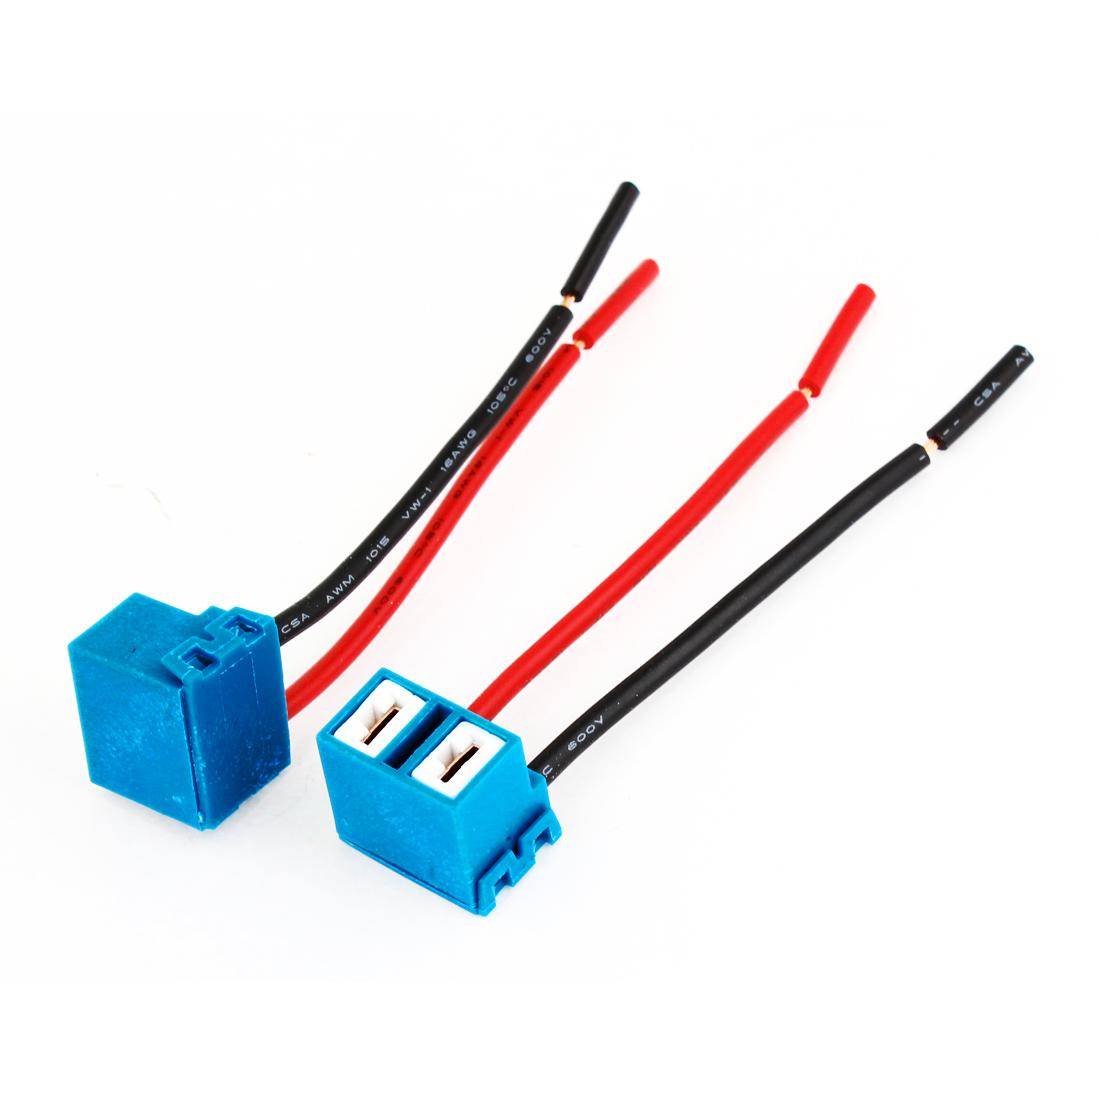 2 x H7 Ceramic Headlight Light Bulb Wire Connector Socket for Car